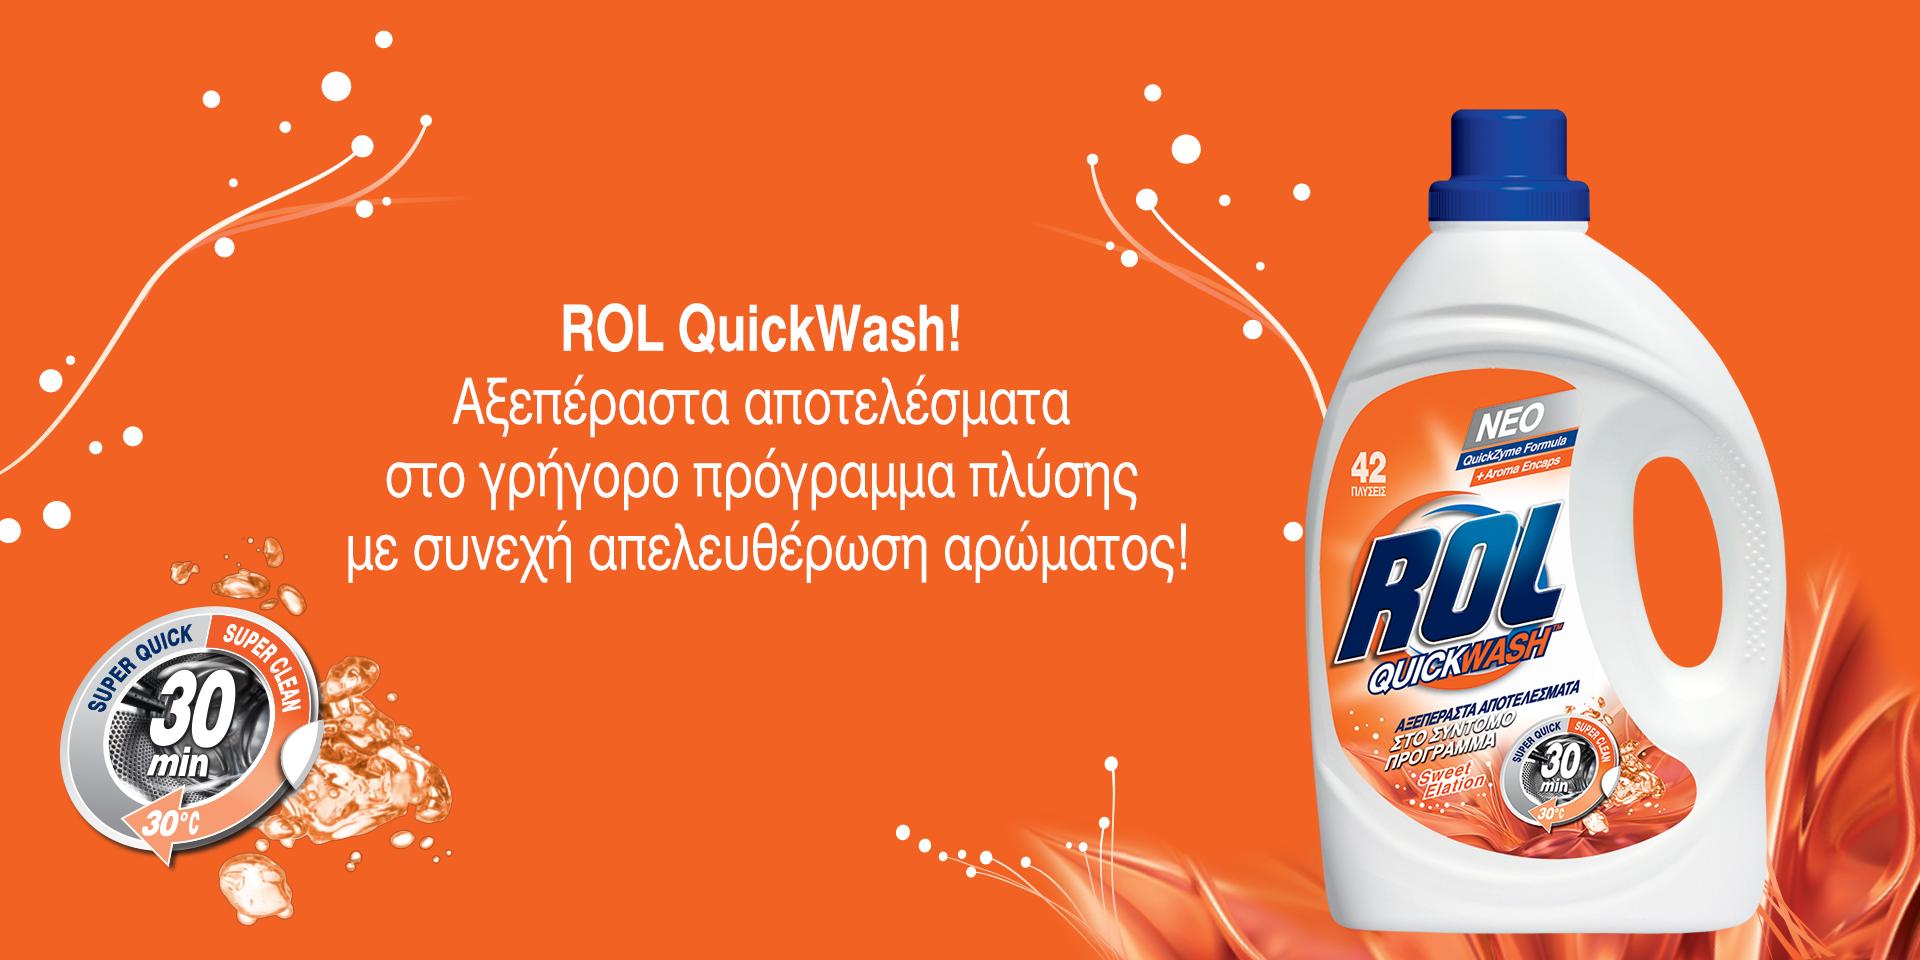 QuickWash_SE_1920x960